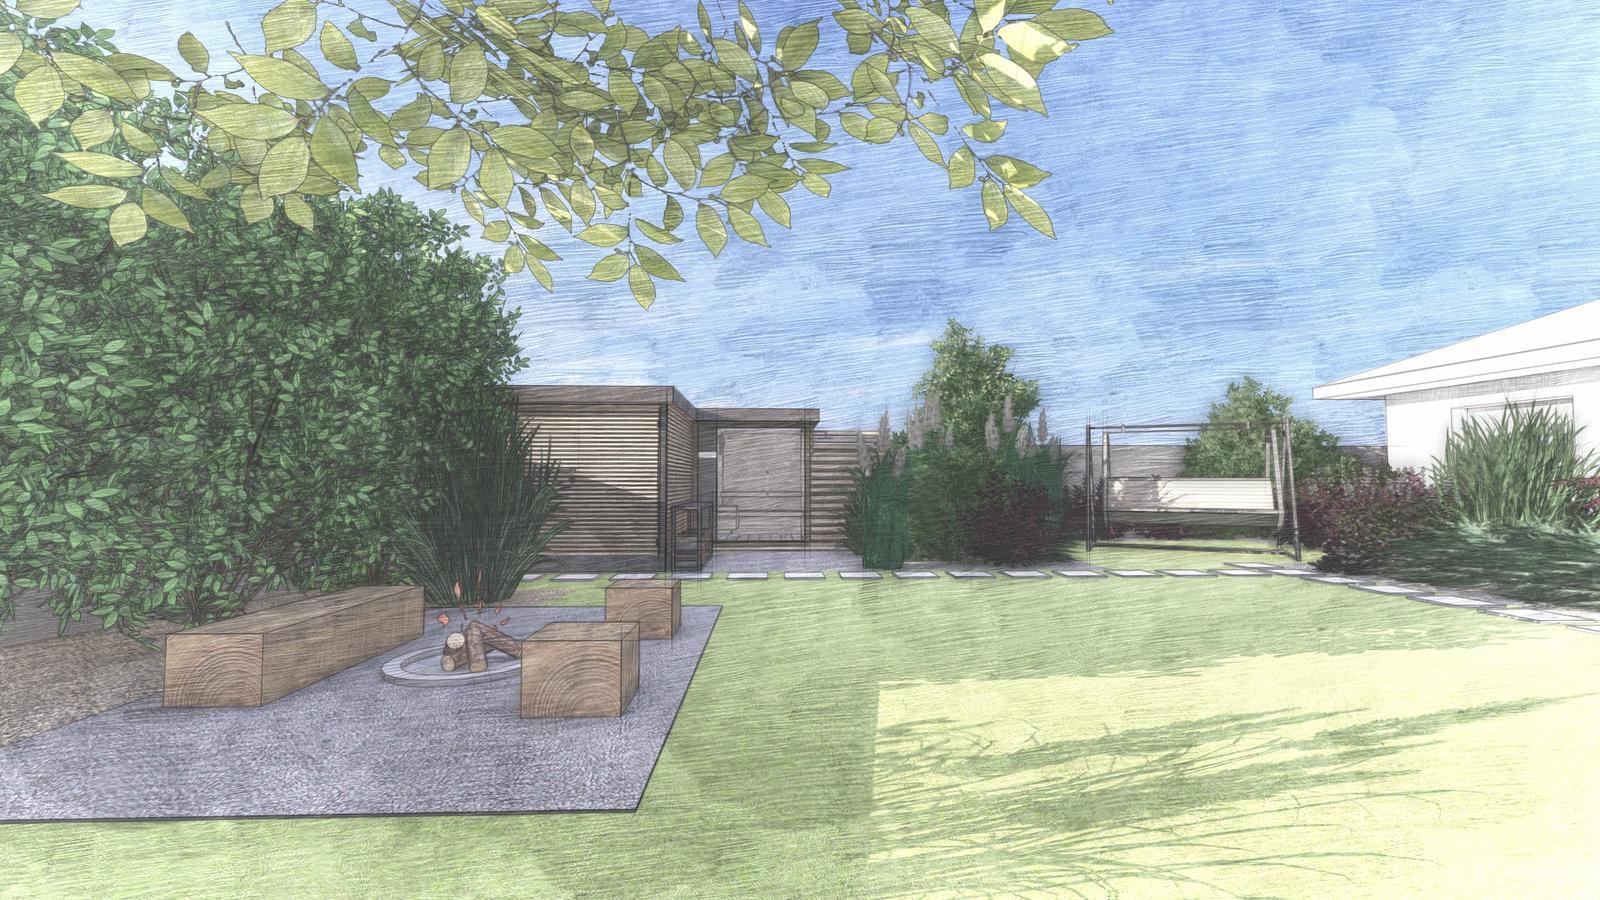 Návrh záhrady rodinného domu - Obrázok č. 9